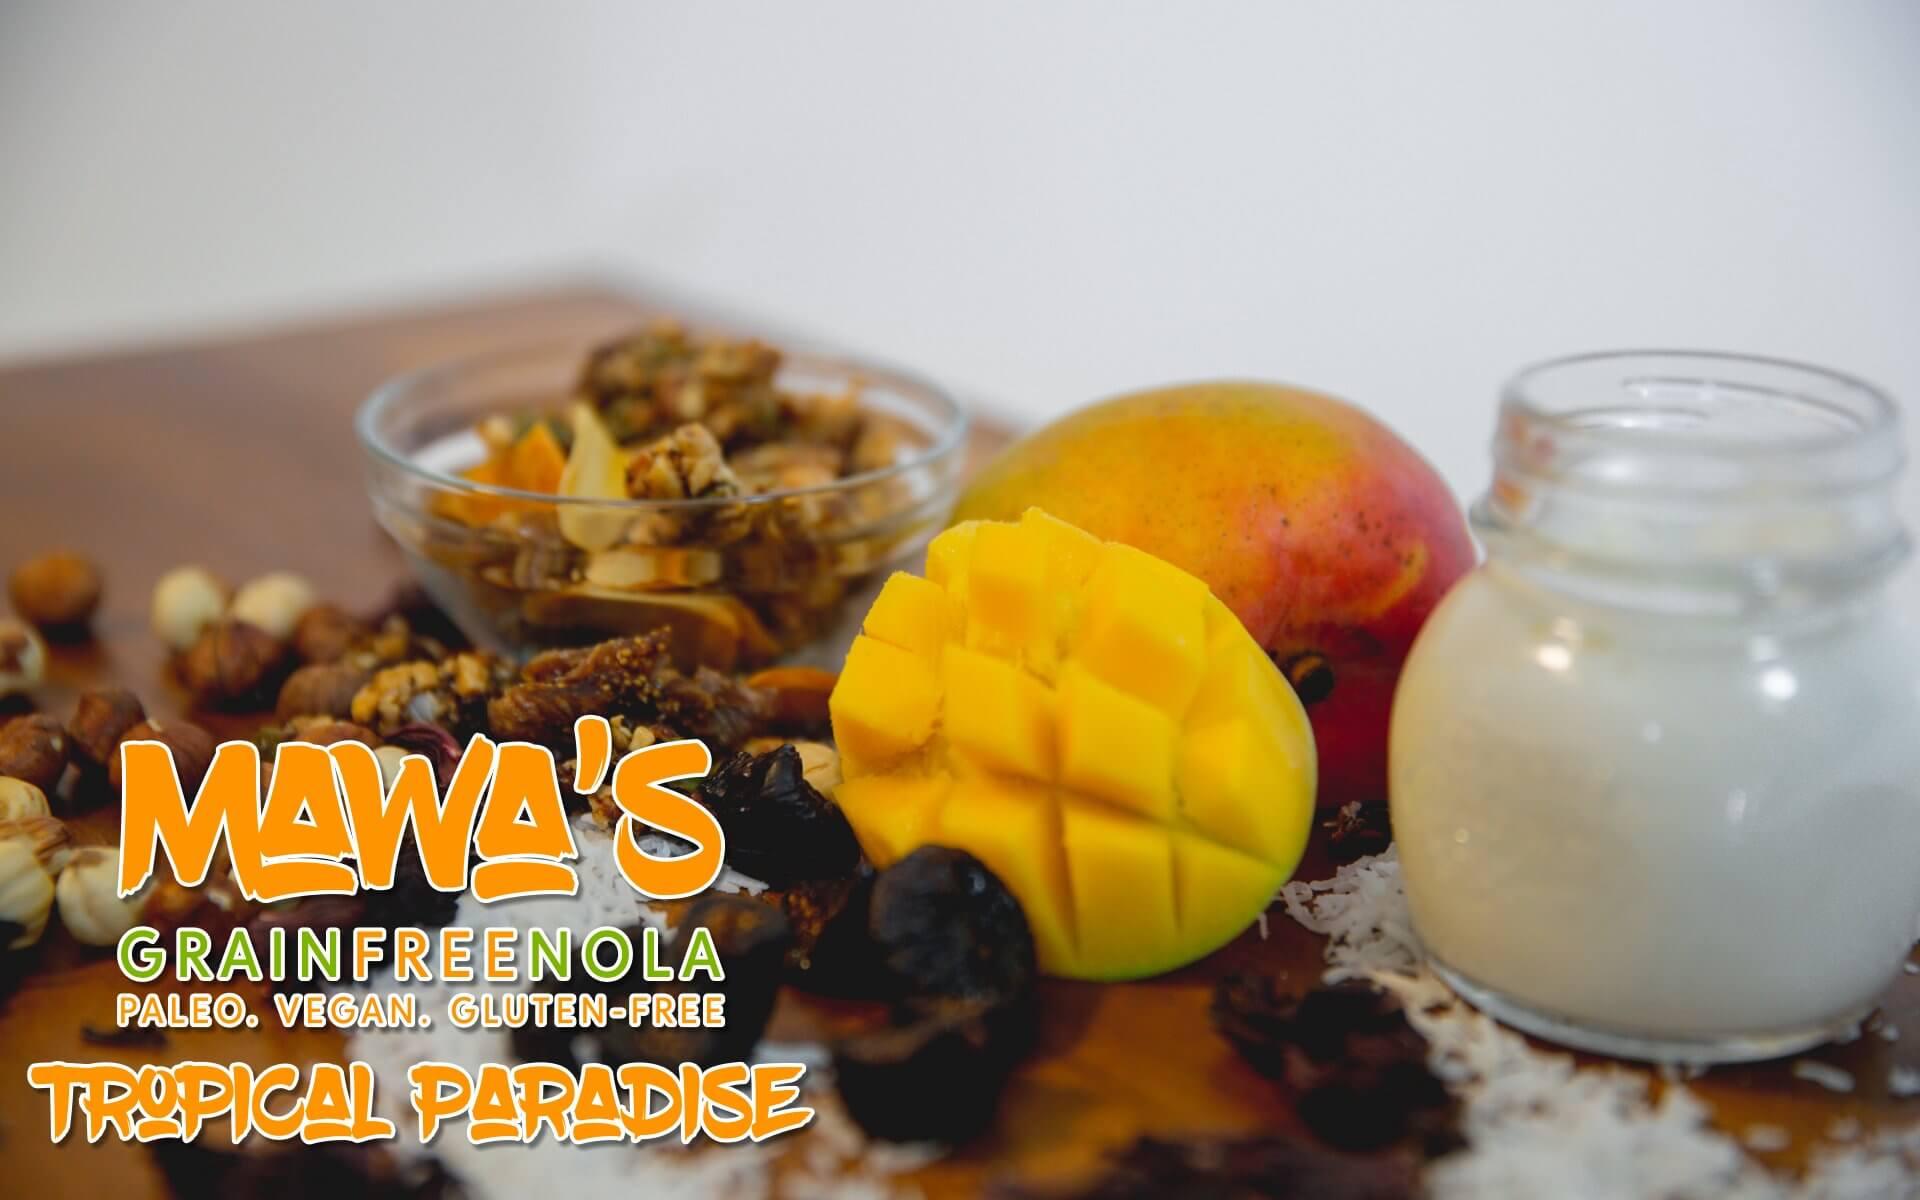 Mawa's GrainFreeNola - Tropical Paradise Paleo, Vegan, Gluten-Free Granola